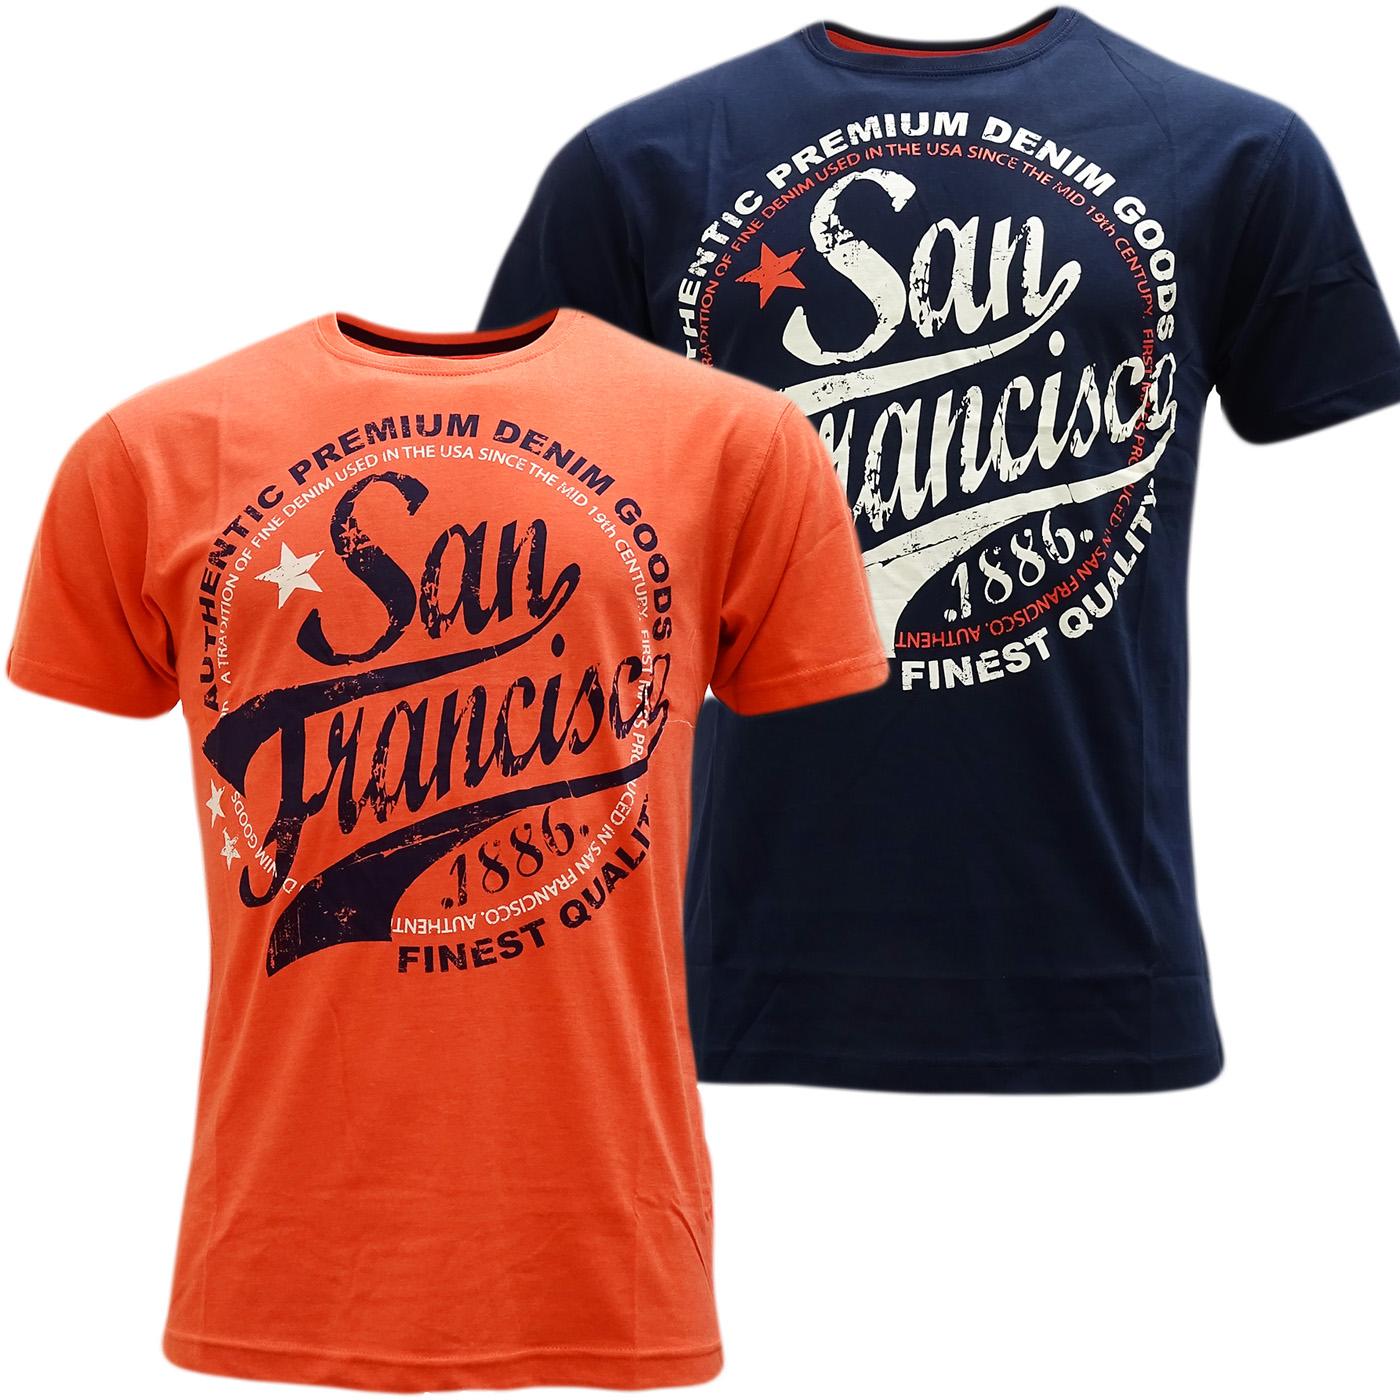 Cargo Designer Top T-Shirt - San Francisco